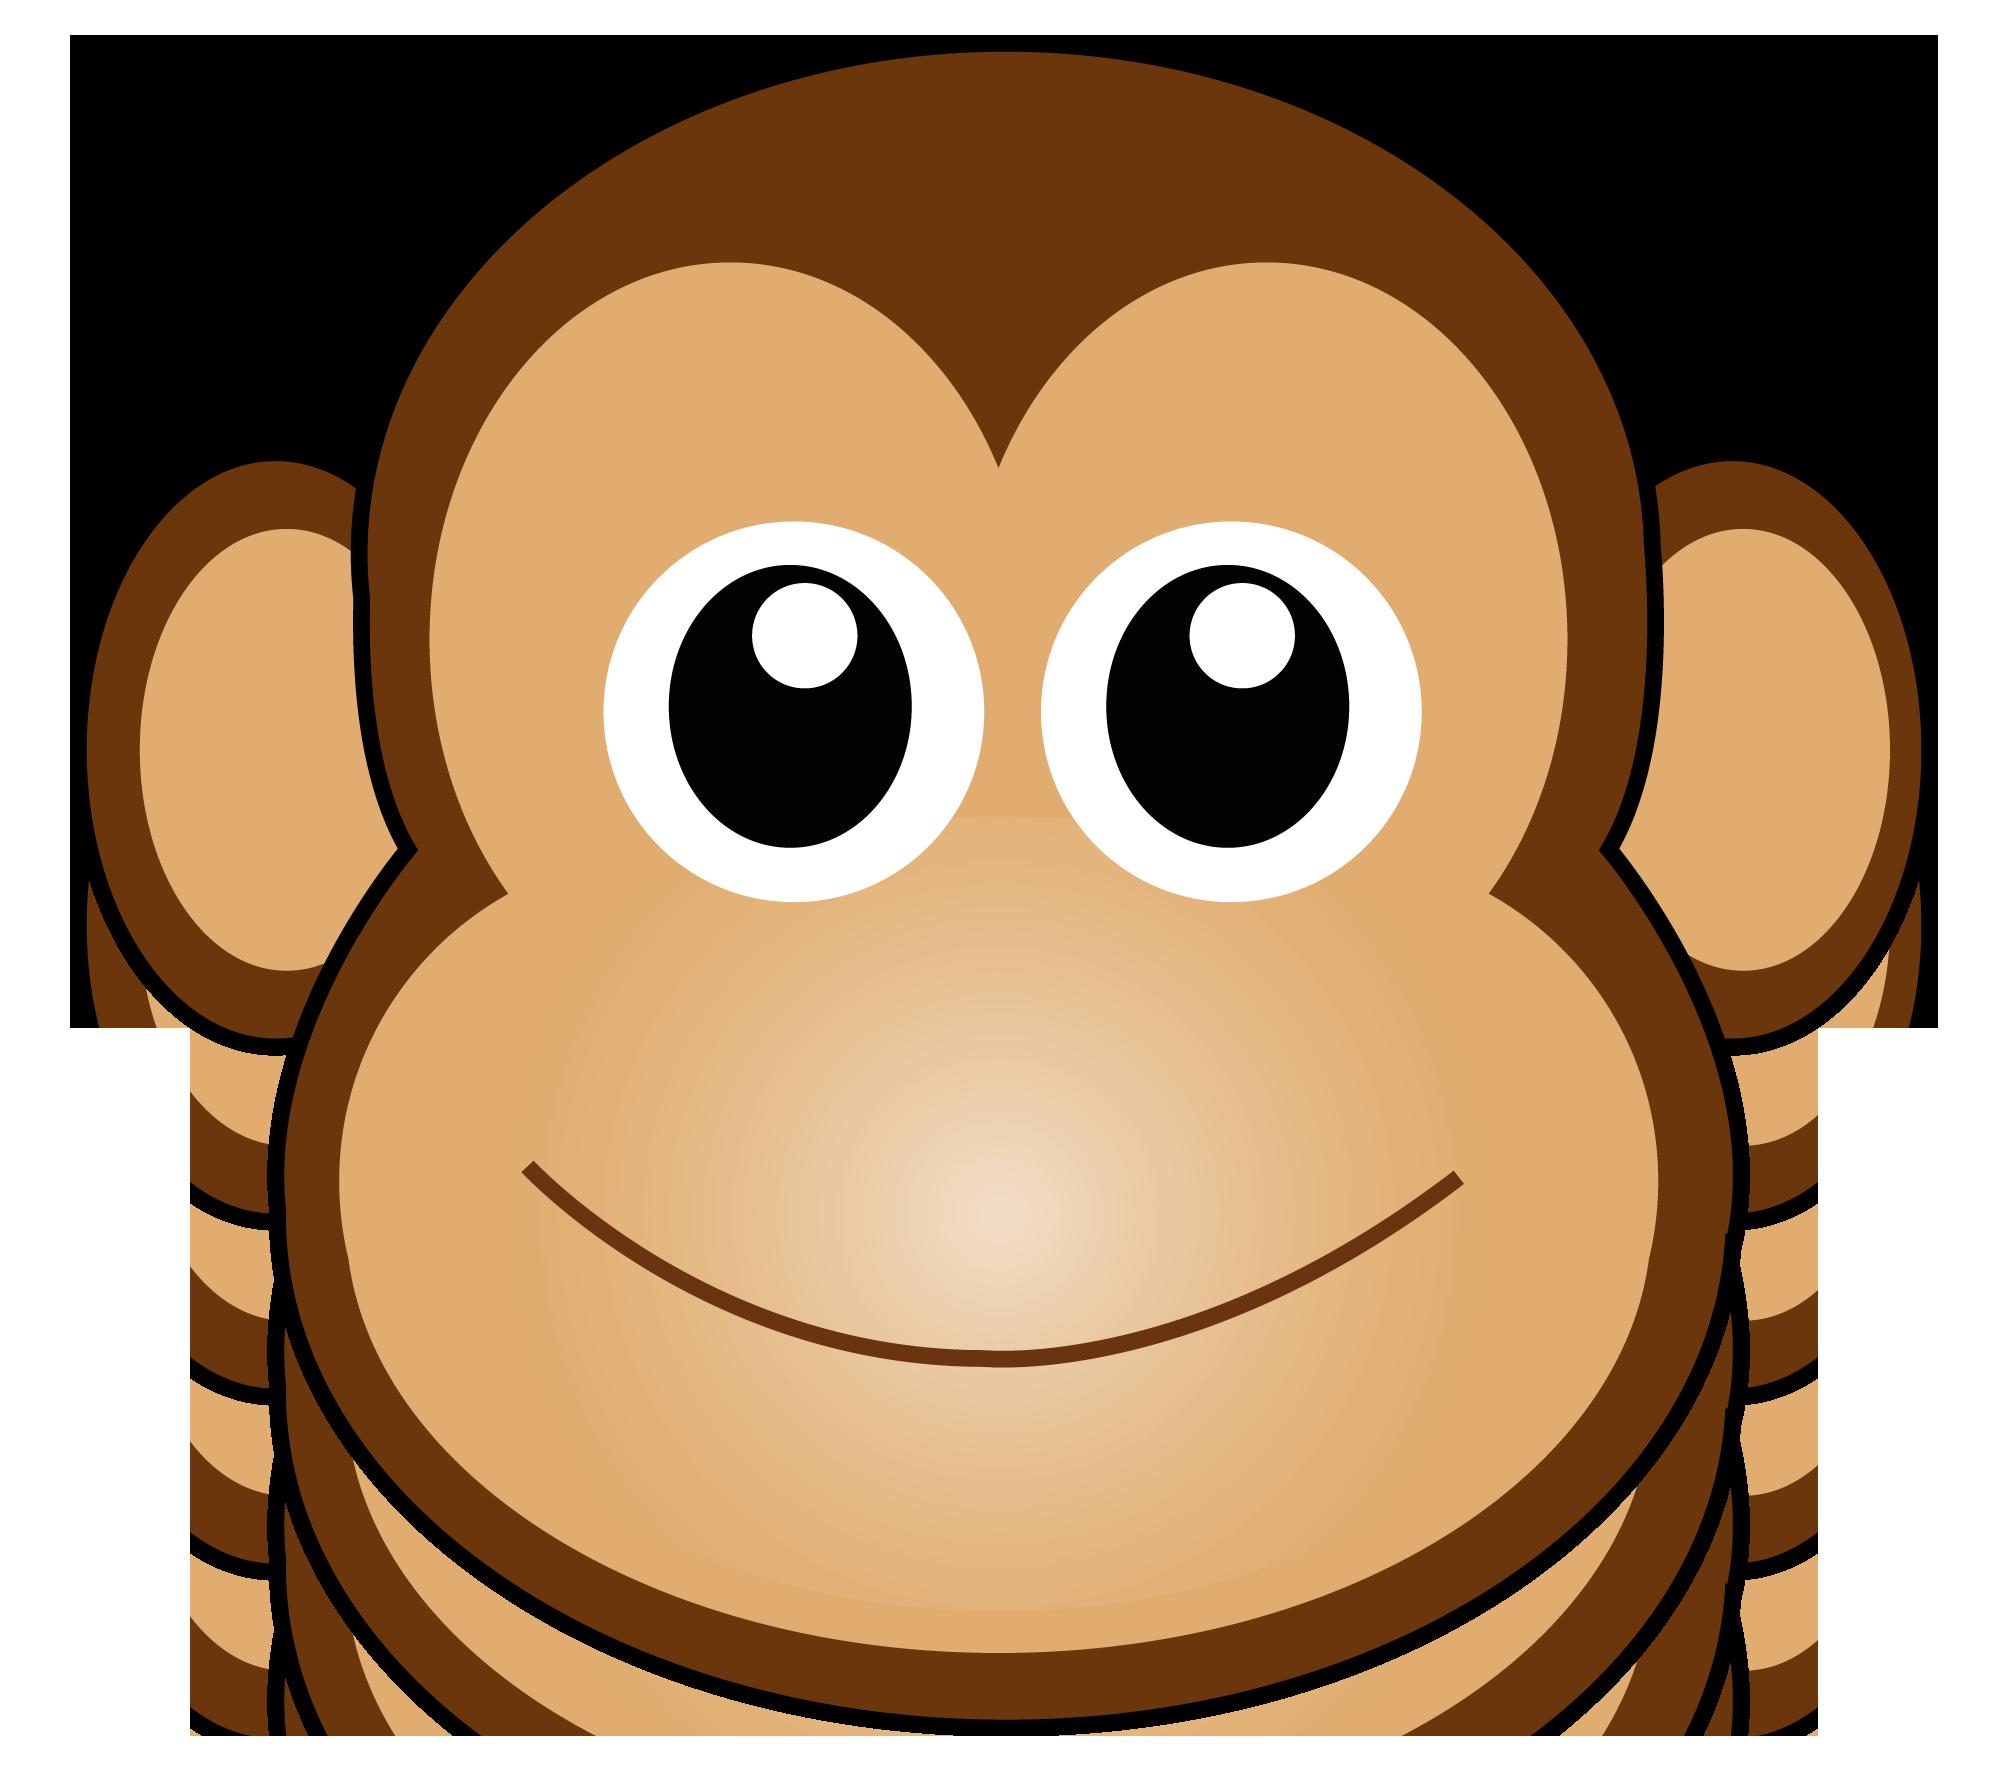 Gambar Smile Monyet Kartun ClipArt Best